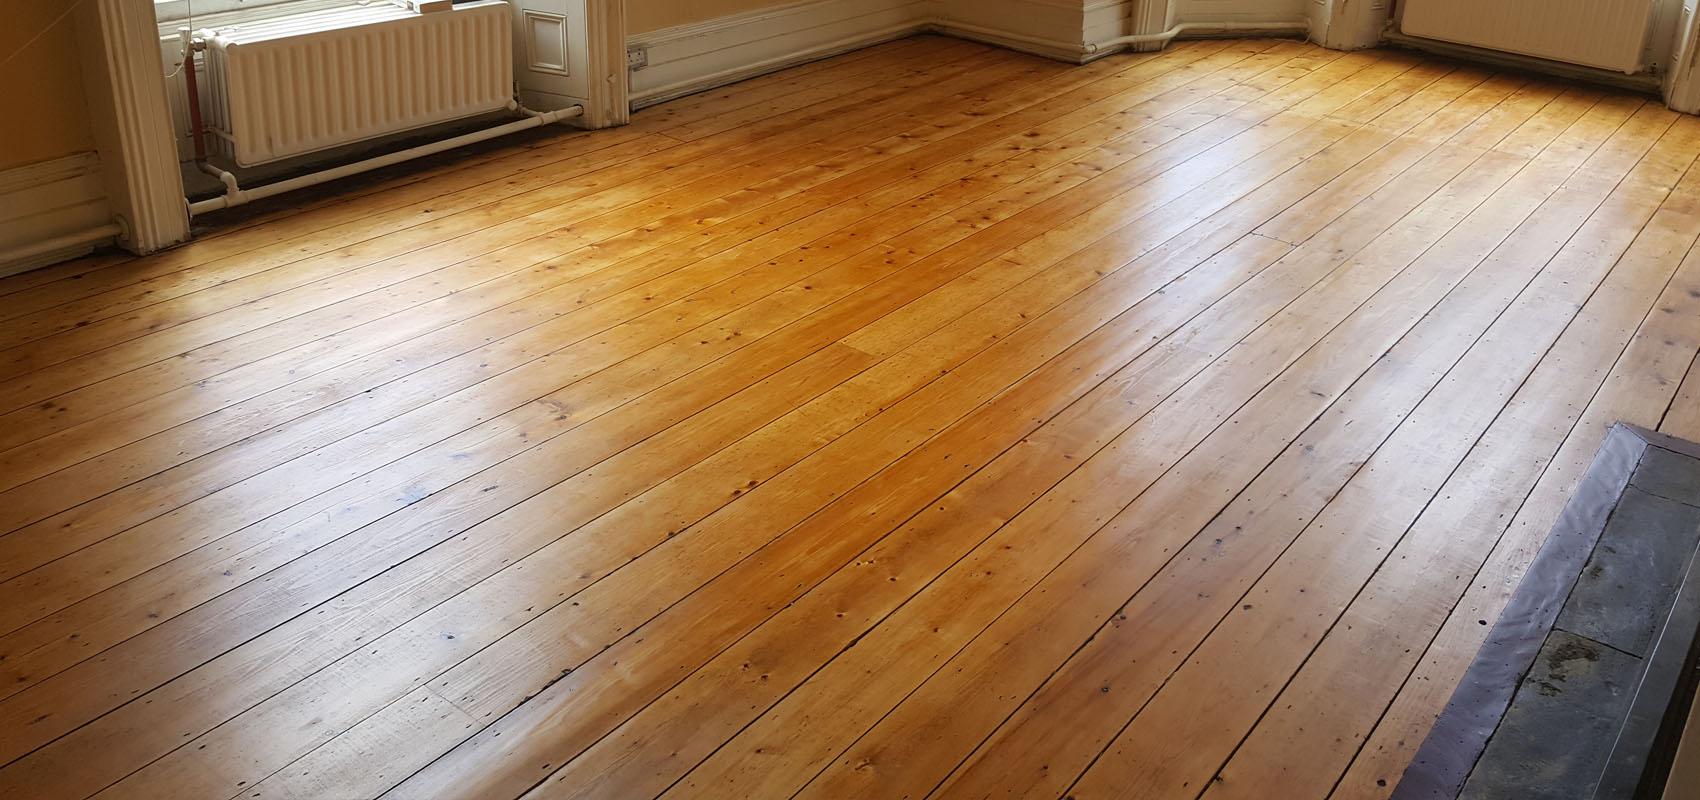 Wood Floor Restoration Smiths French Polishing Furniture Floor